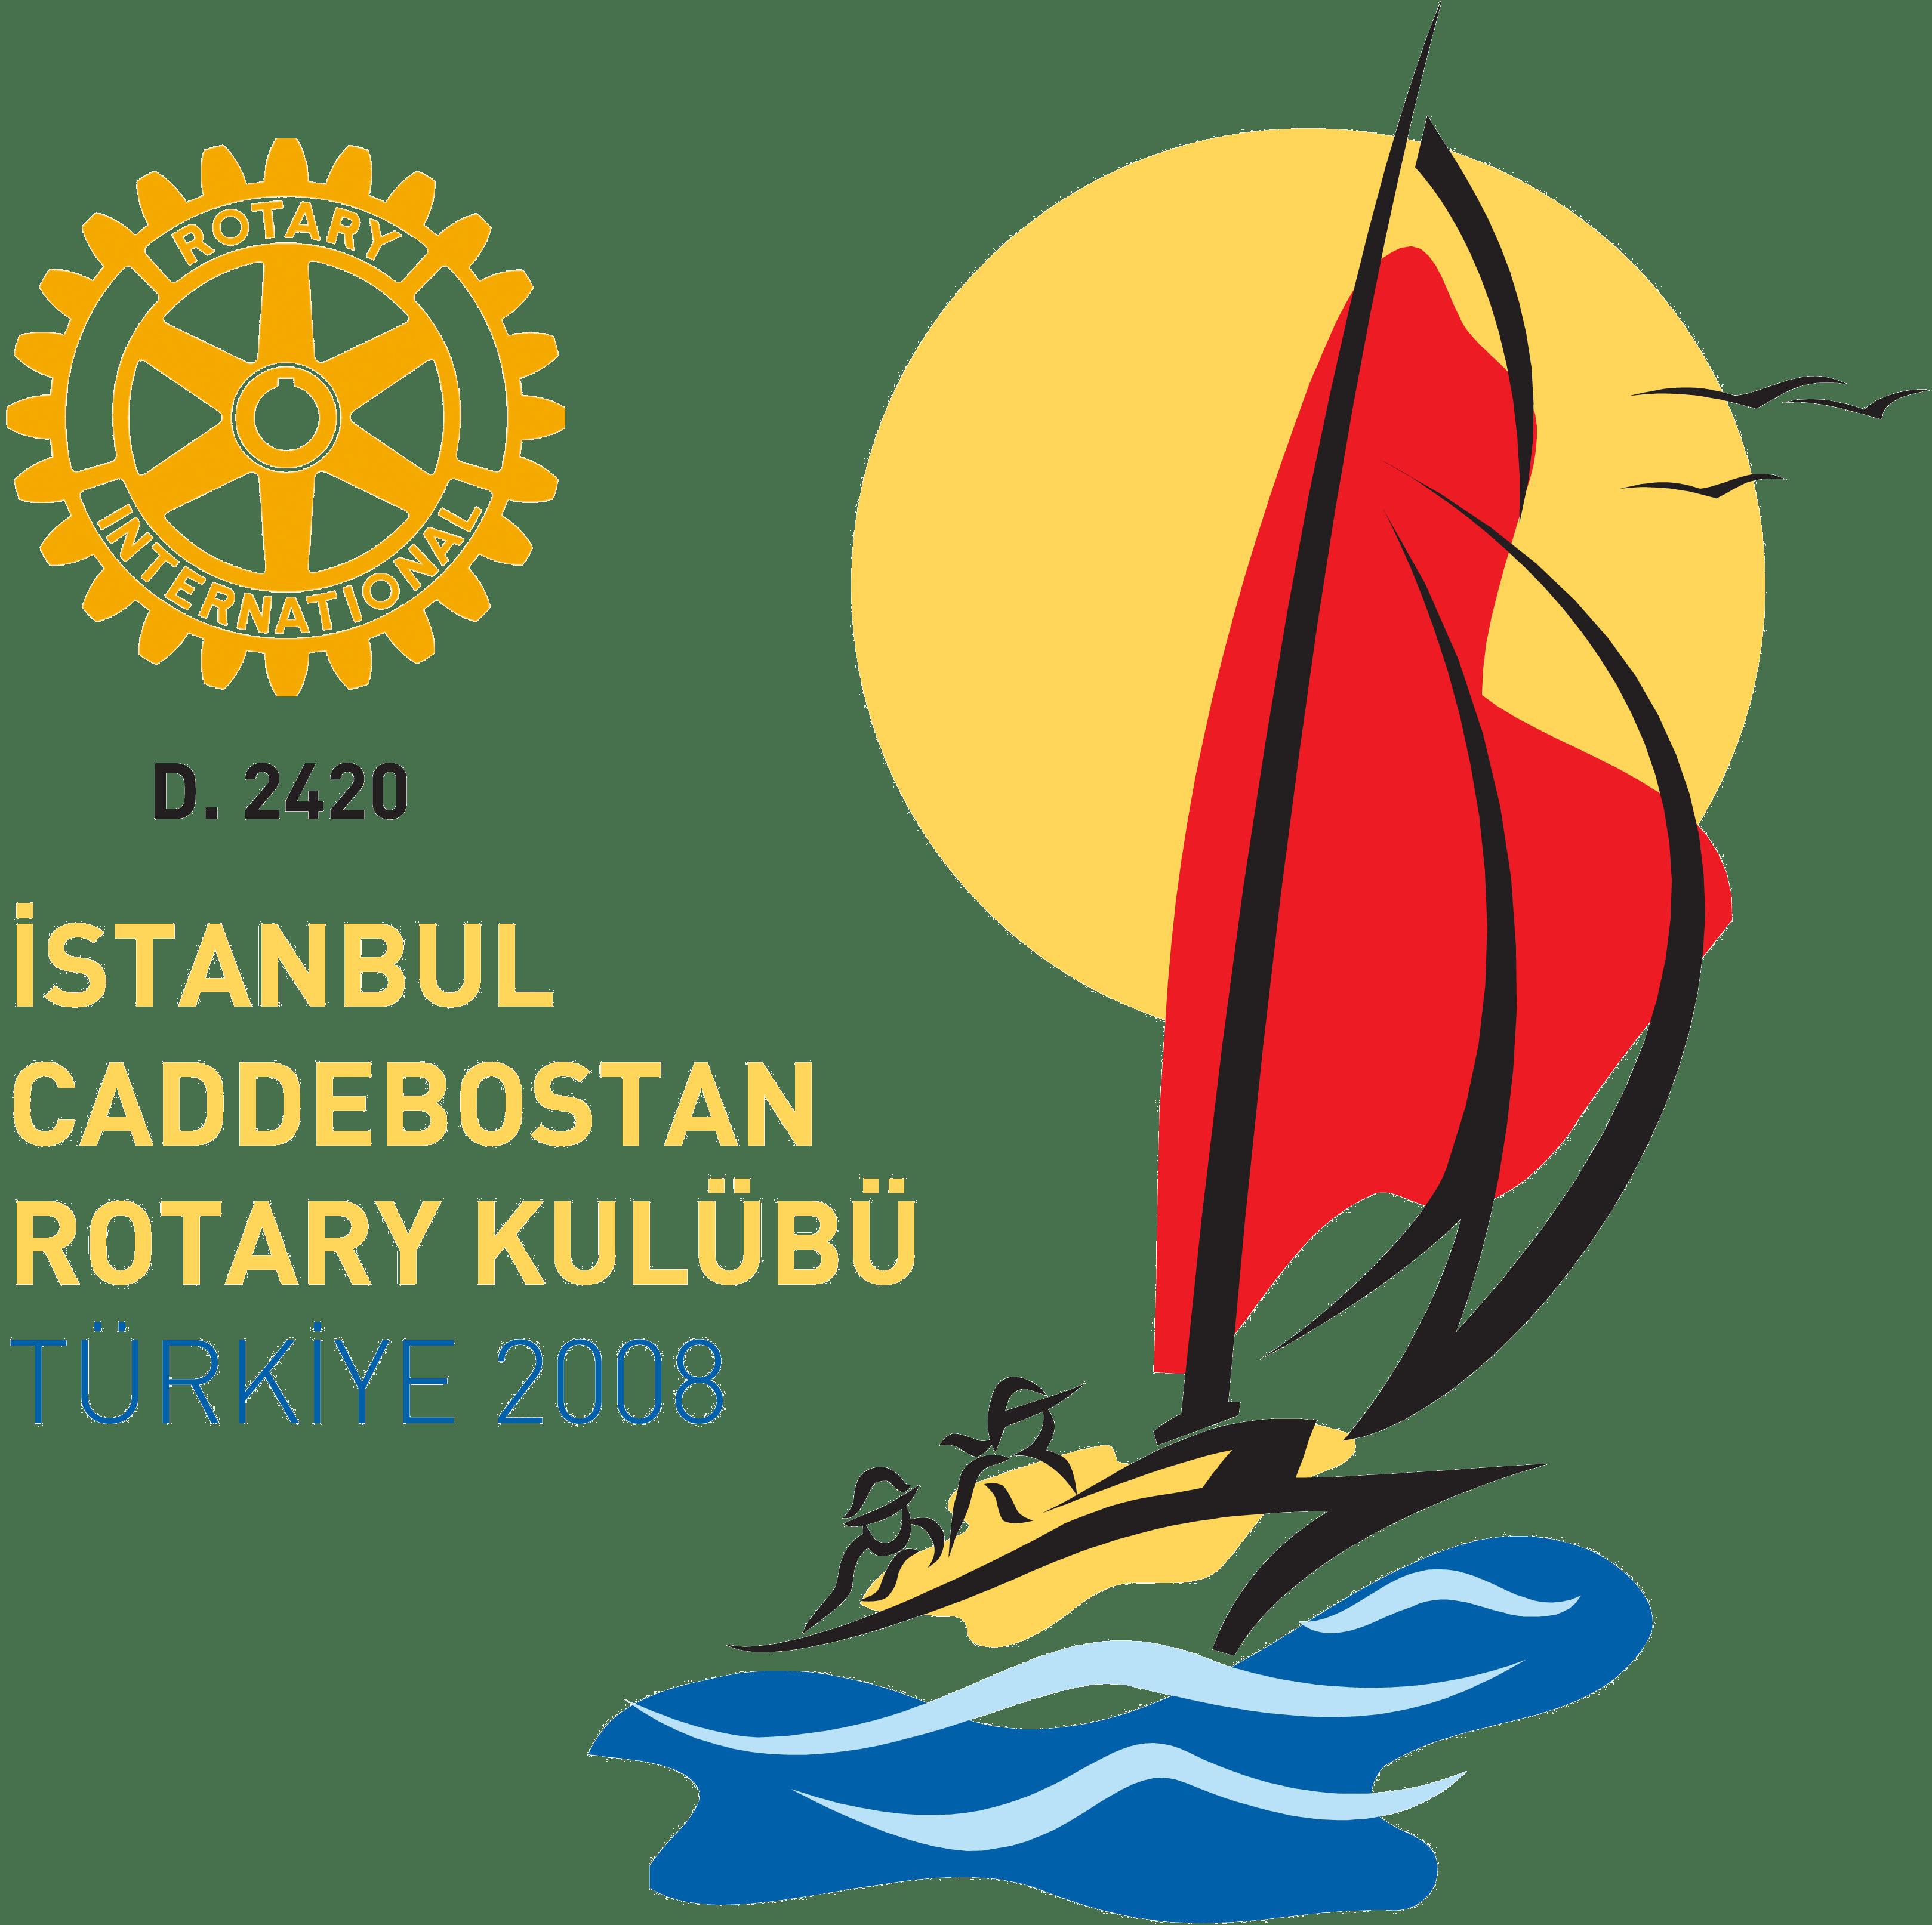 Caddebostan Rotary Kulübü